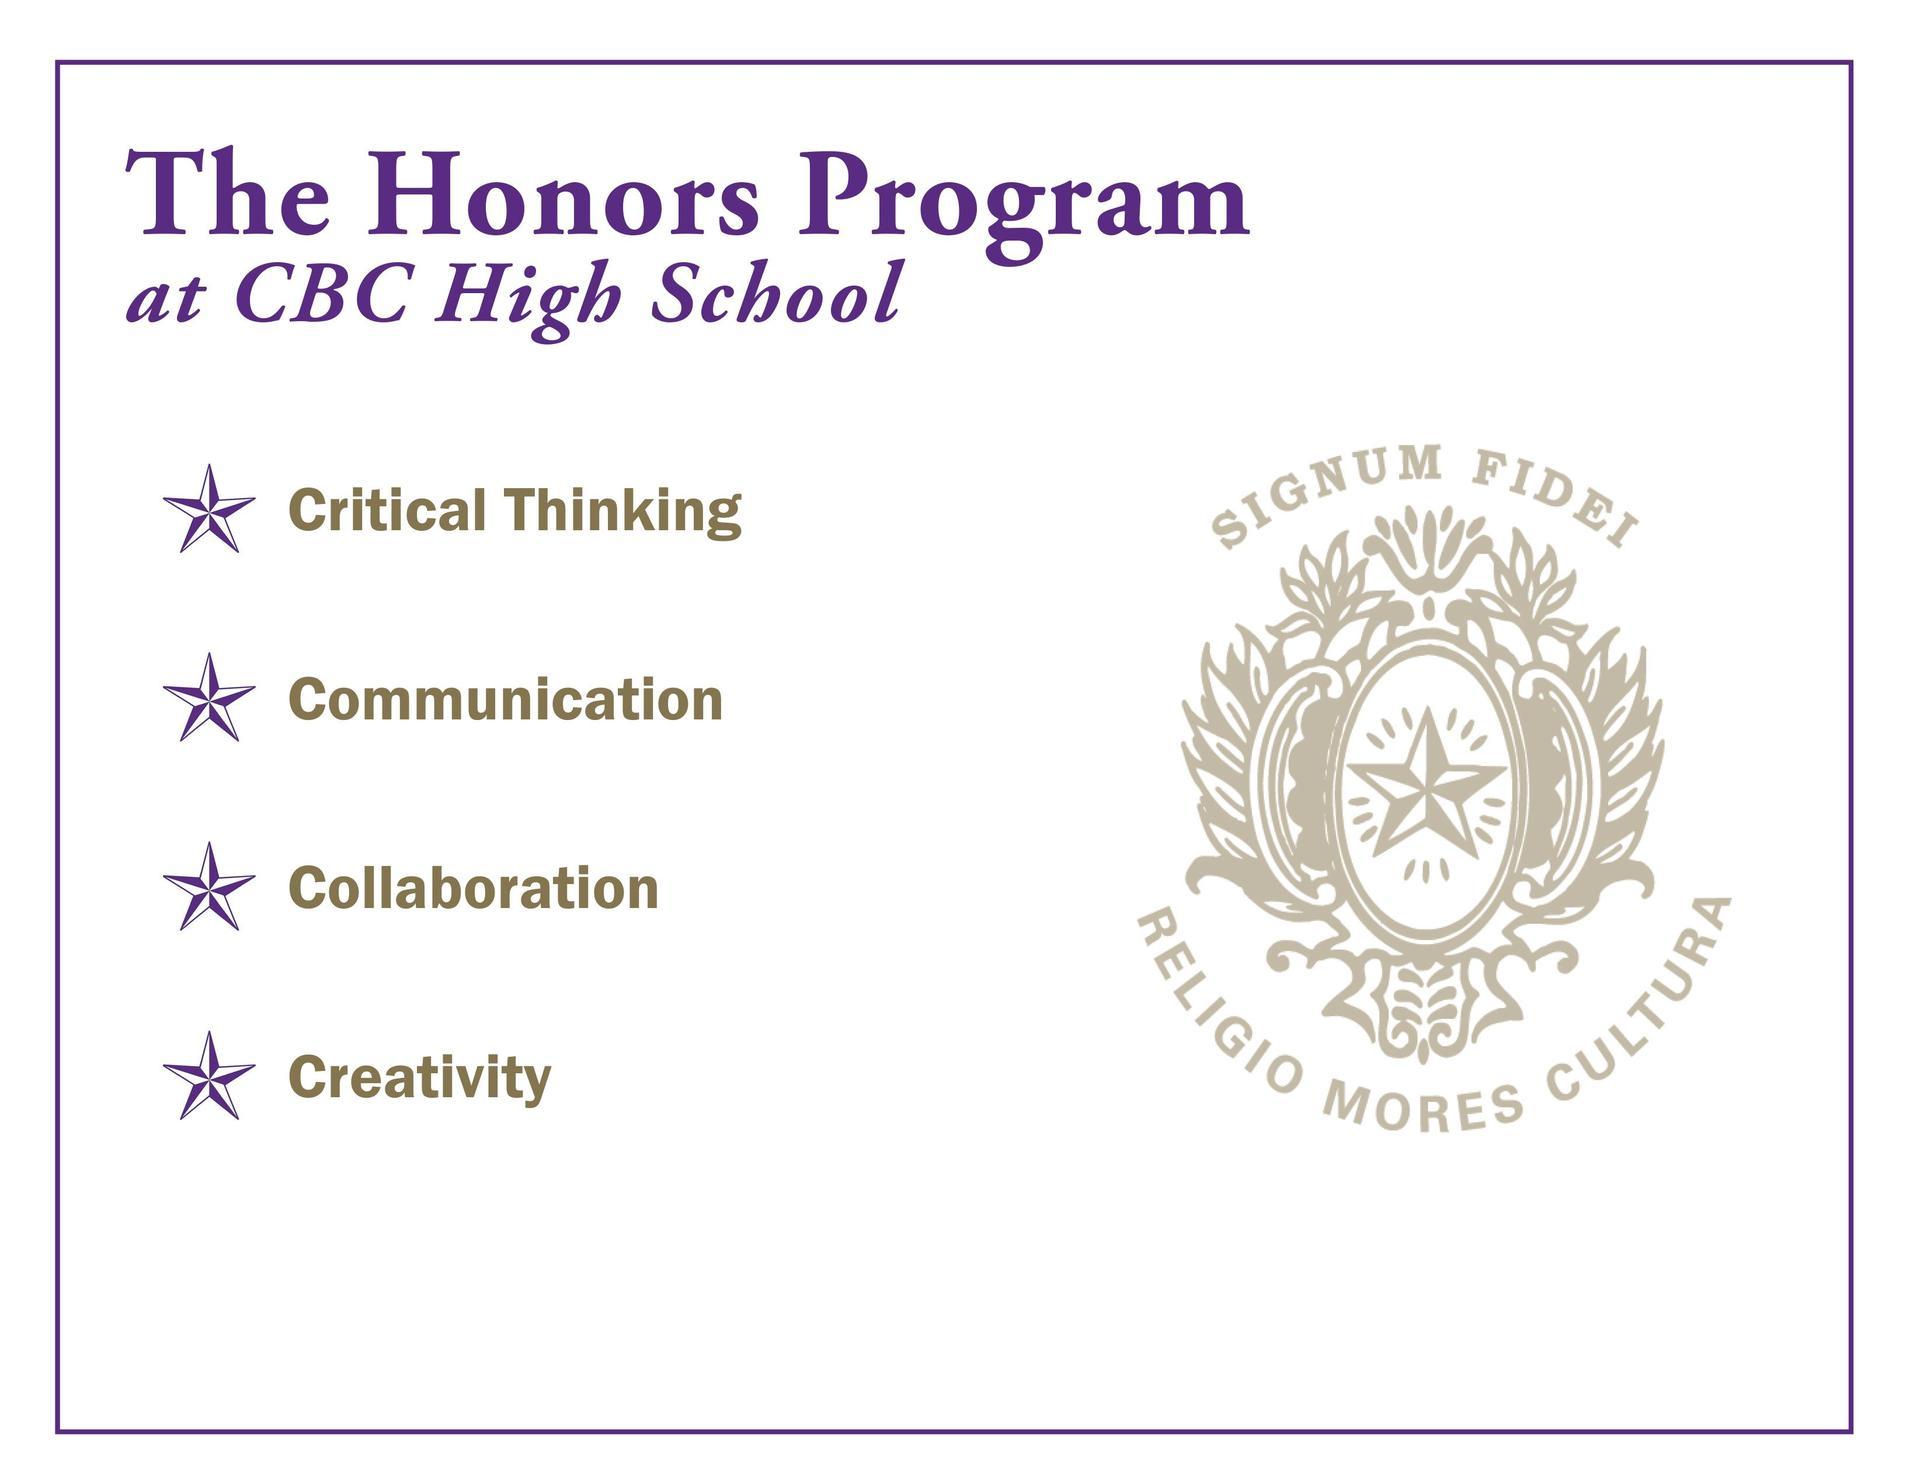 Honors Program information